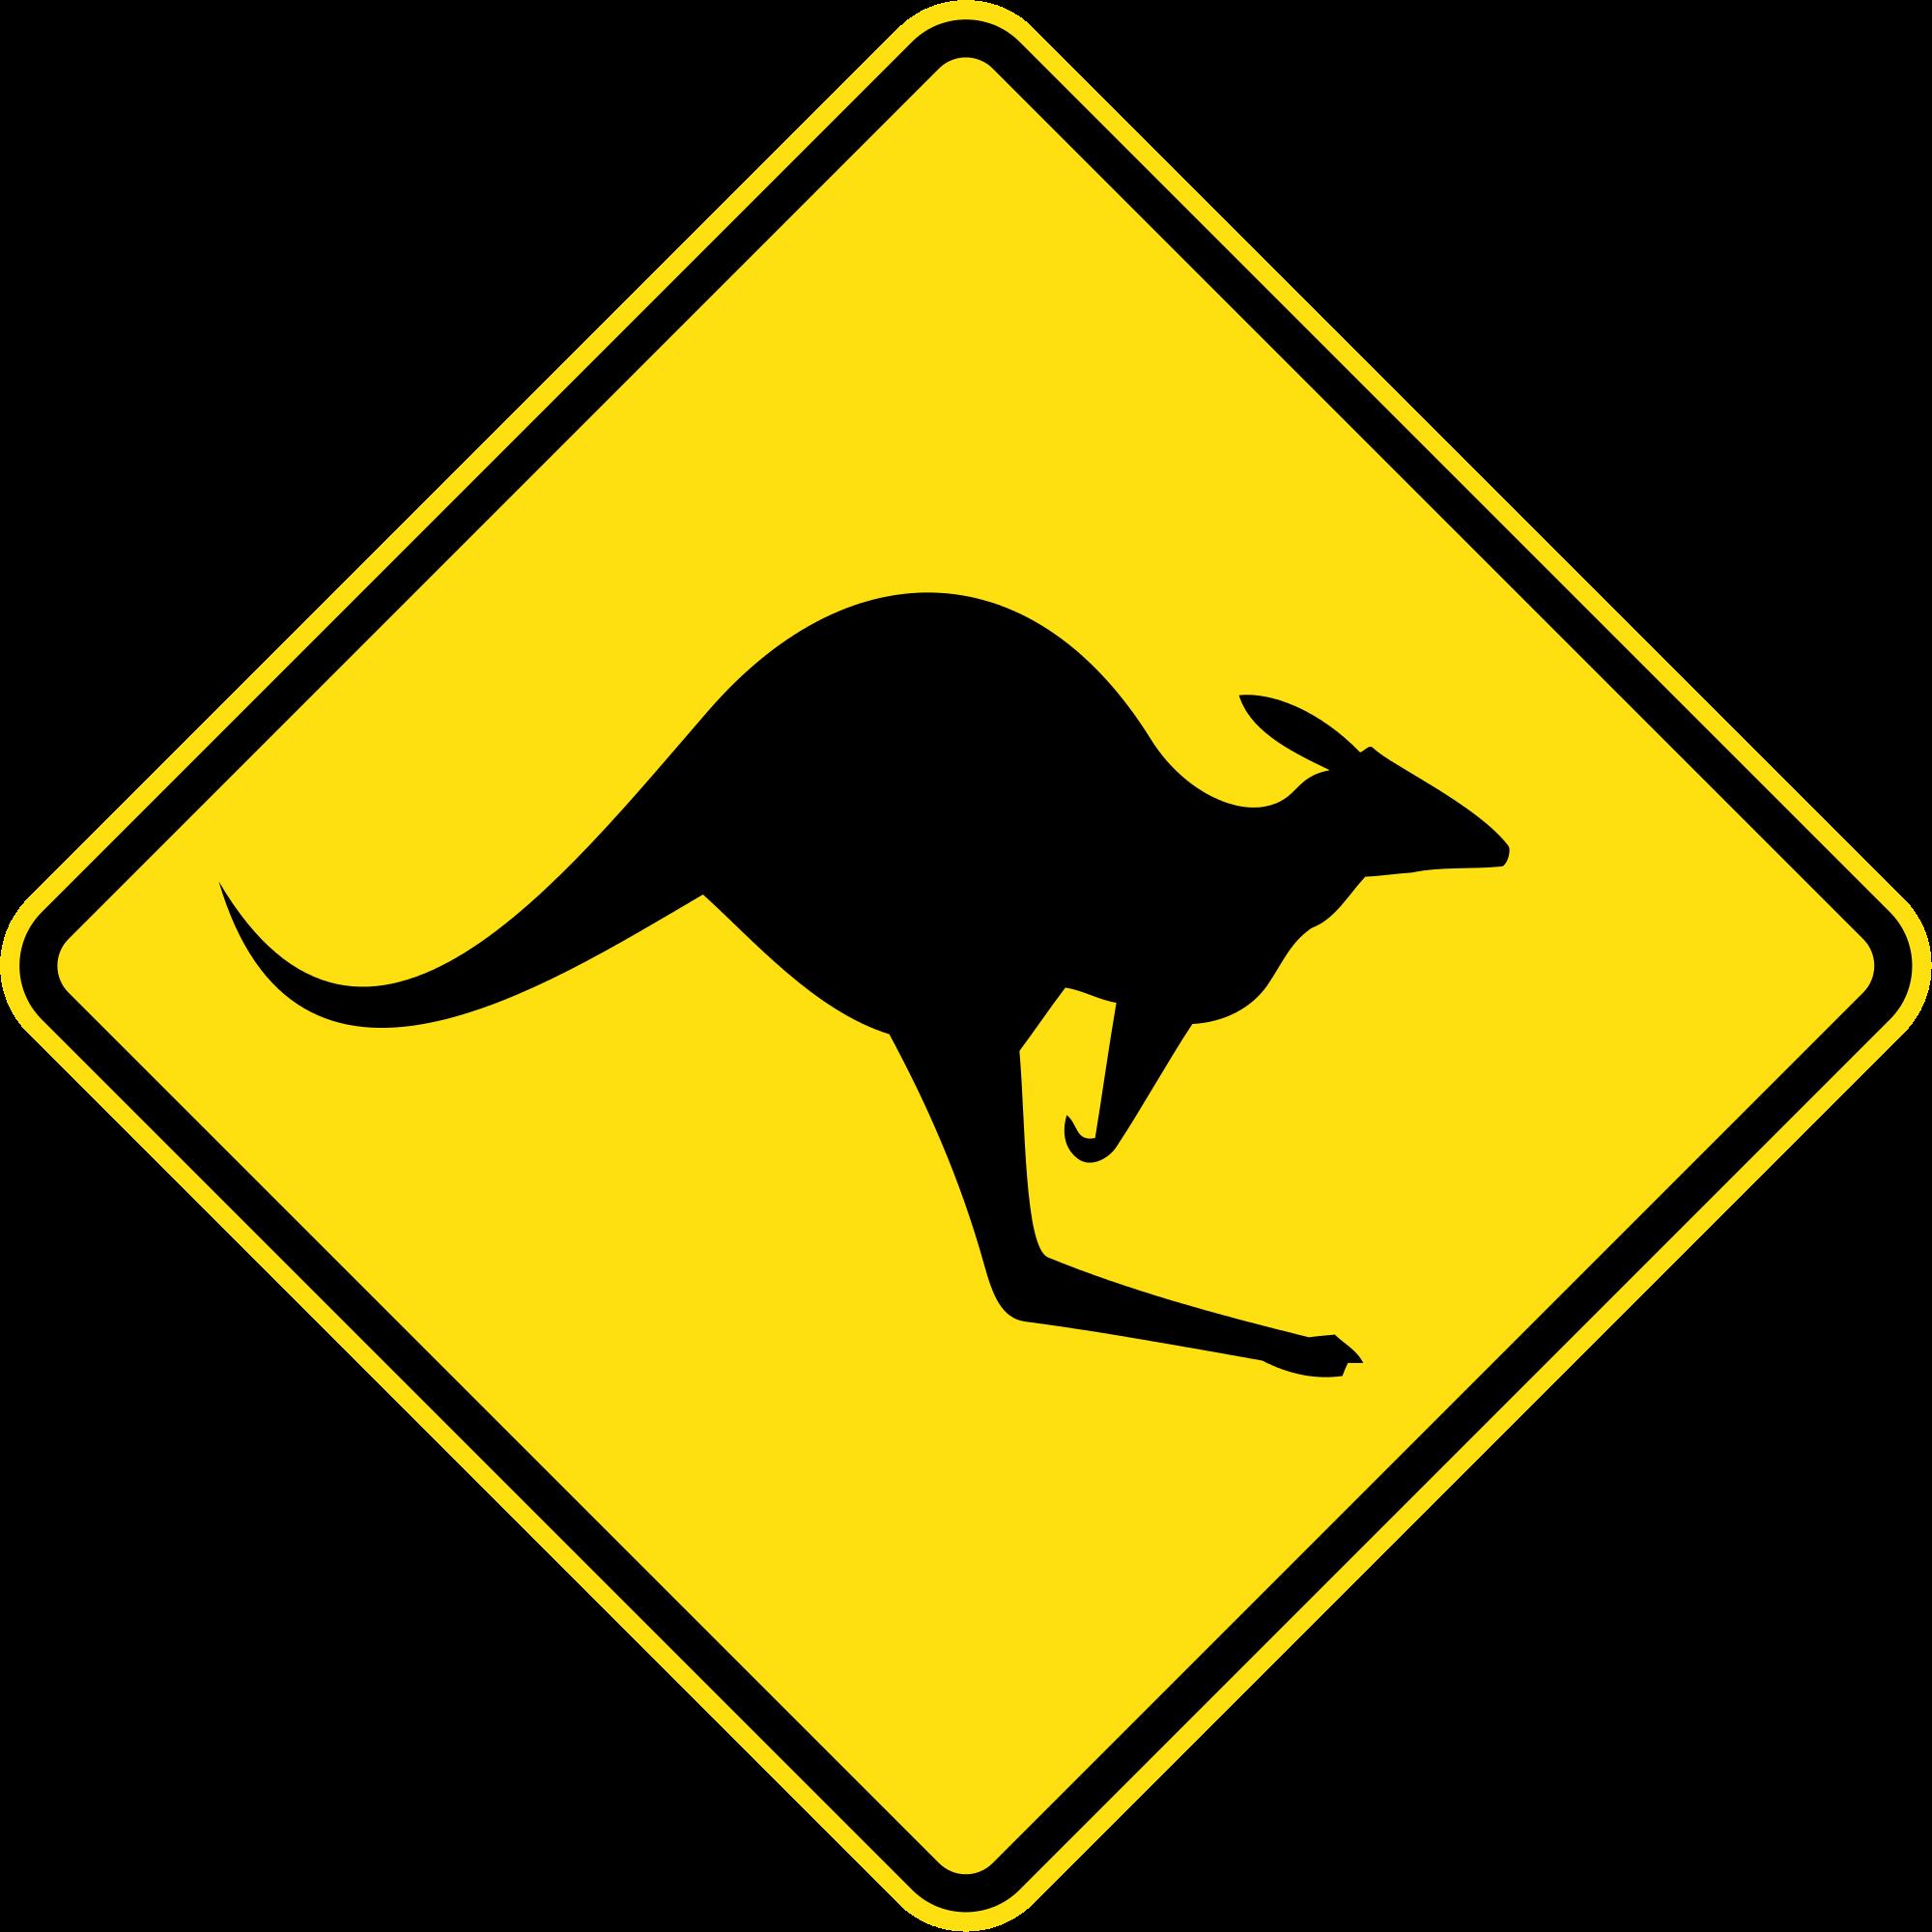 File:Australia road sign W5-29.svg - Wikimedia Commons